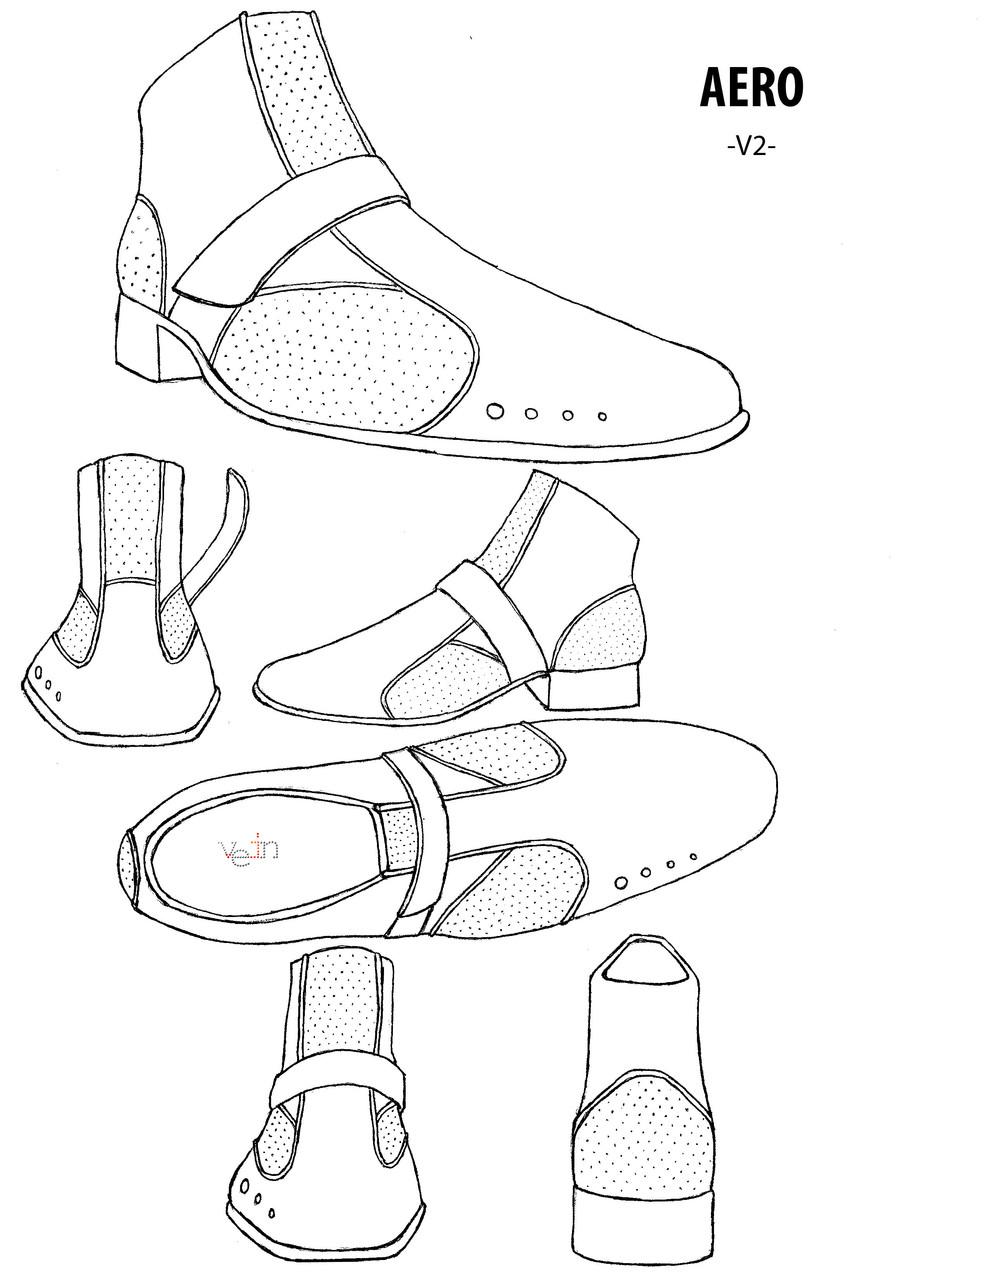 The Aero shoe design. 2011 Vein Wear Design winner!